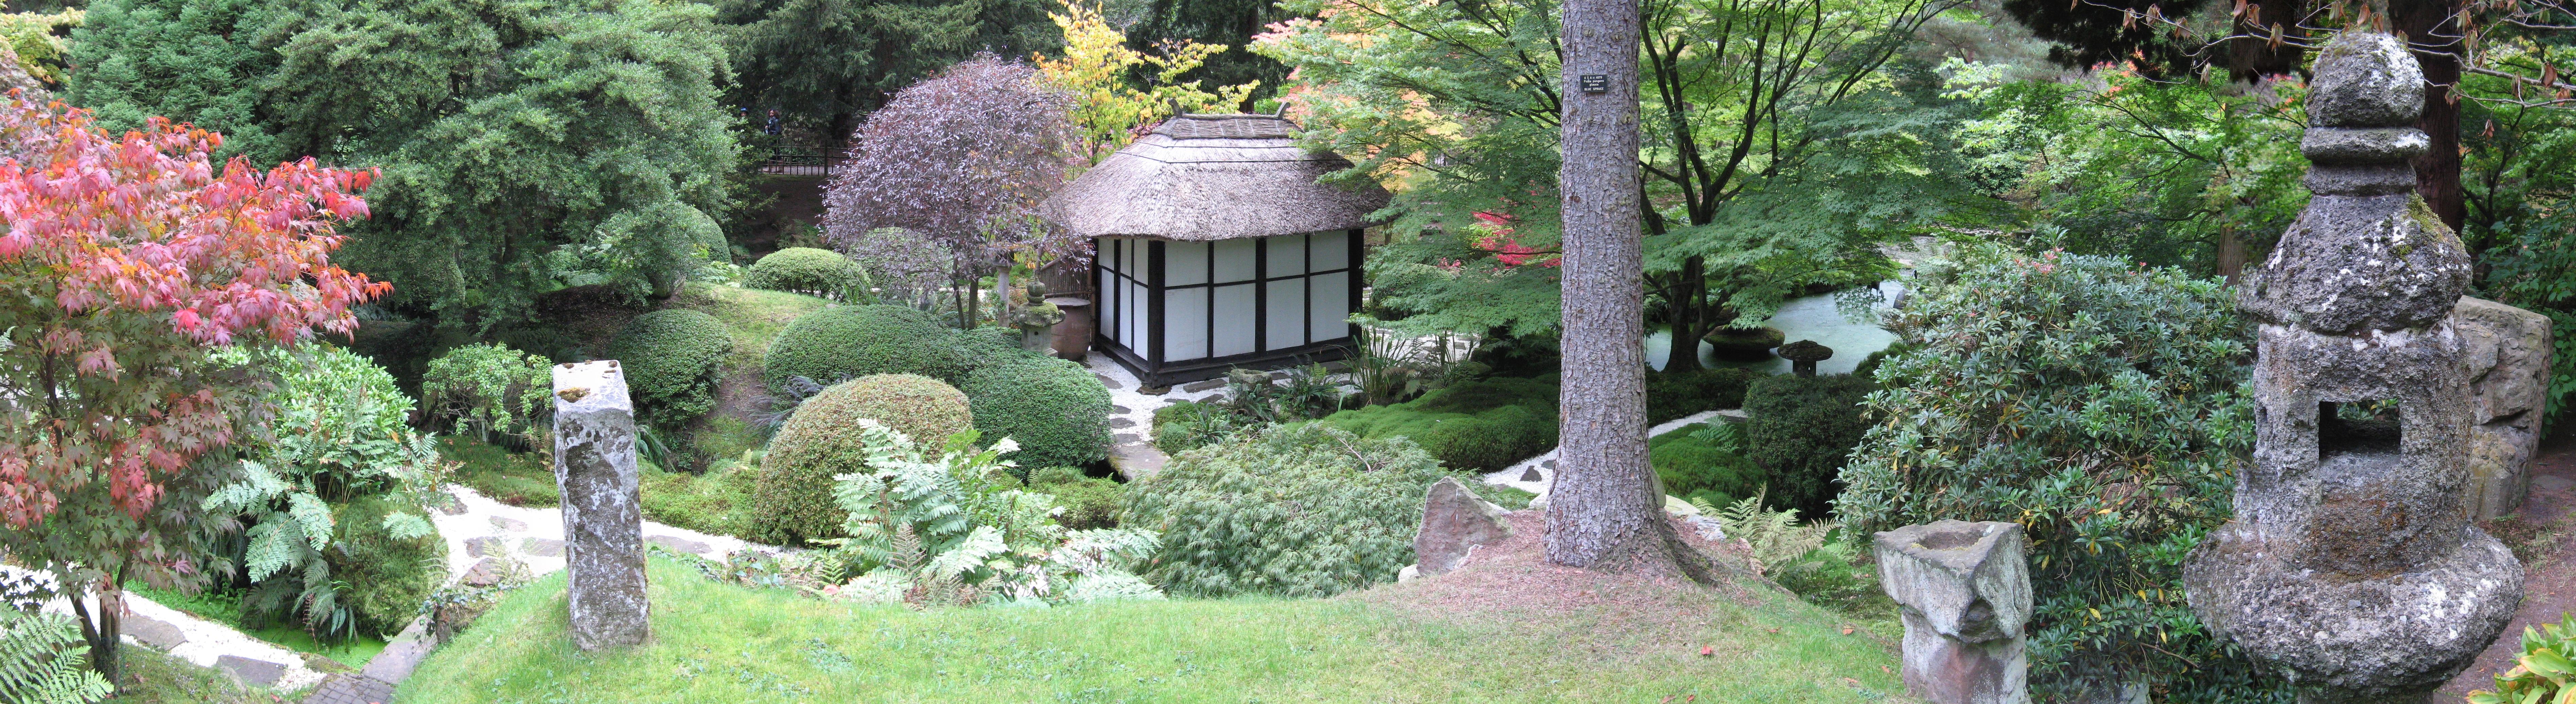 FileJapanese Garden Tatton Park Wide Viewjpg Wikipedia